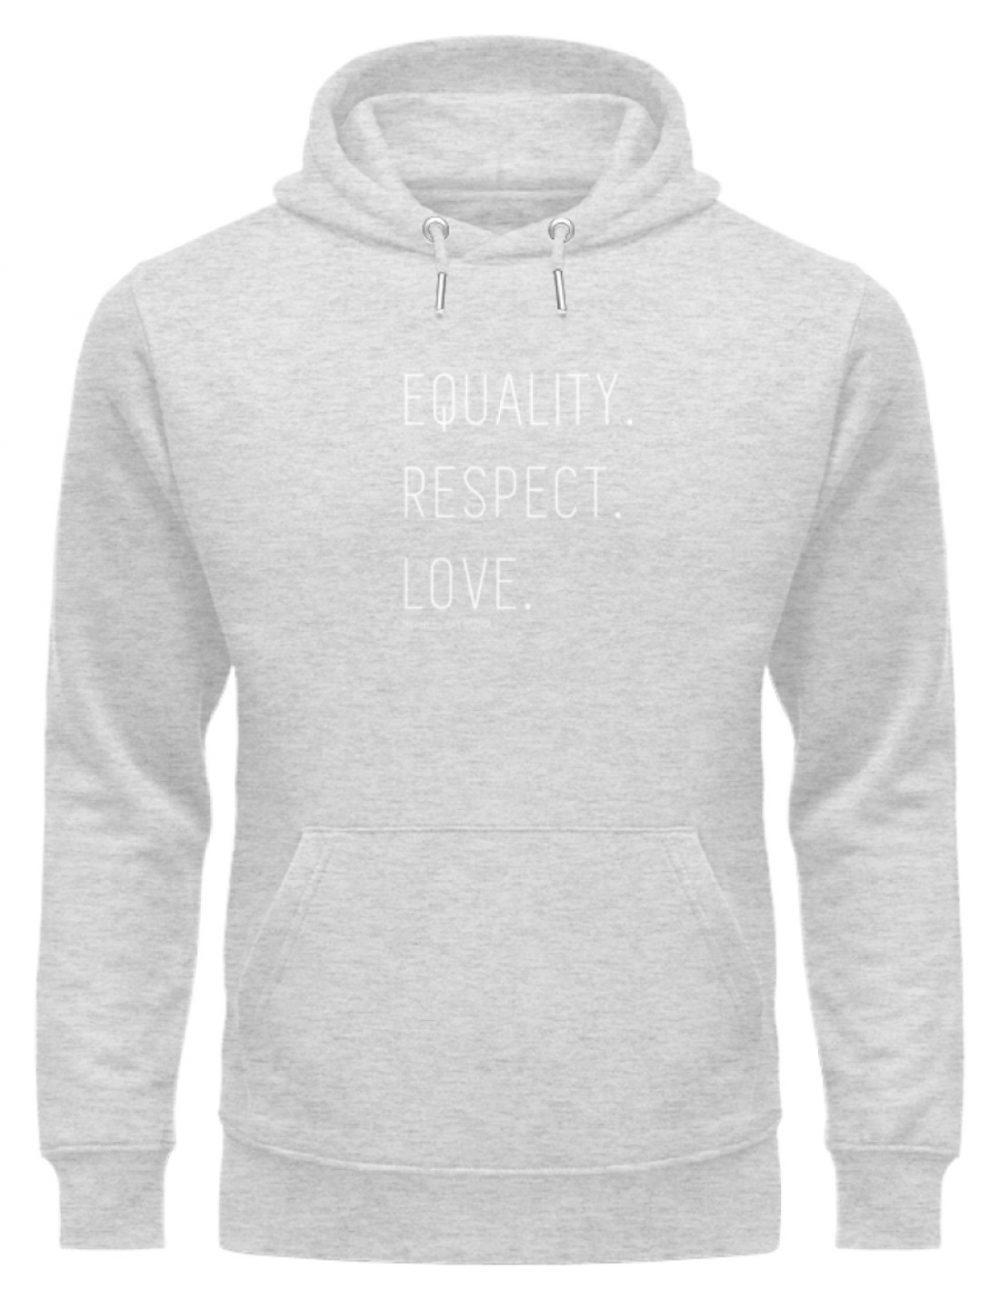 EQUALITY. RESPECT. LOVE. - Unisex Organic Hoodie-6892